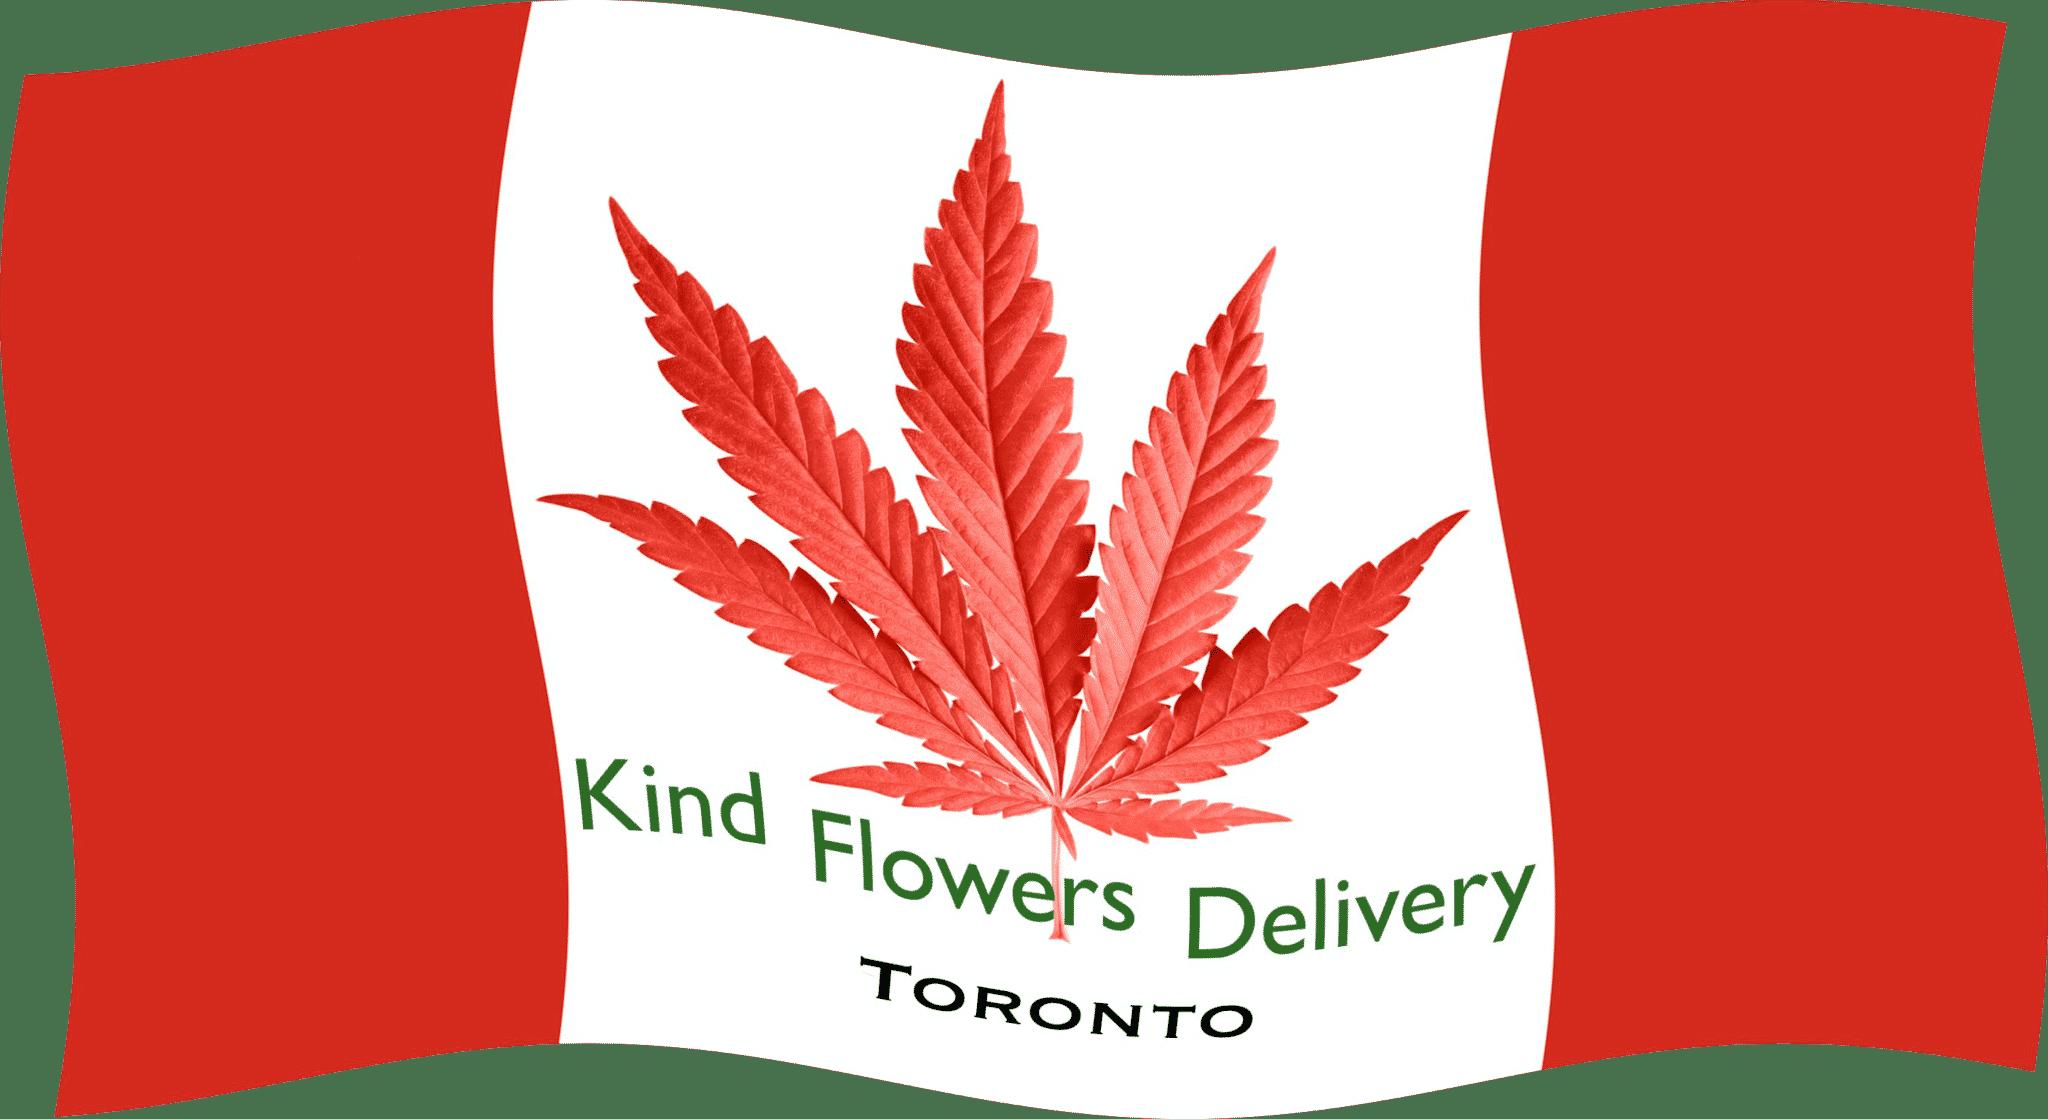 Kind Flowers logo 2020 - Kind Flowers